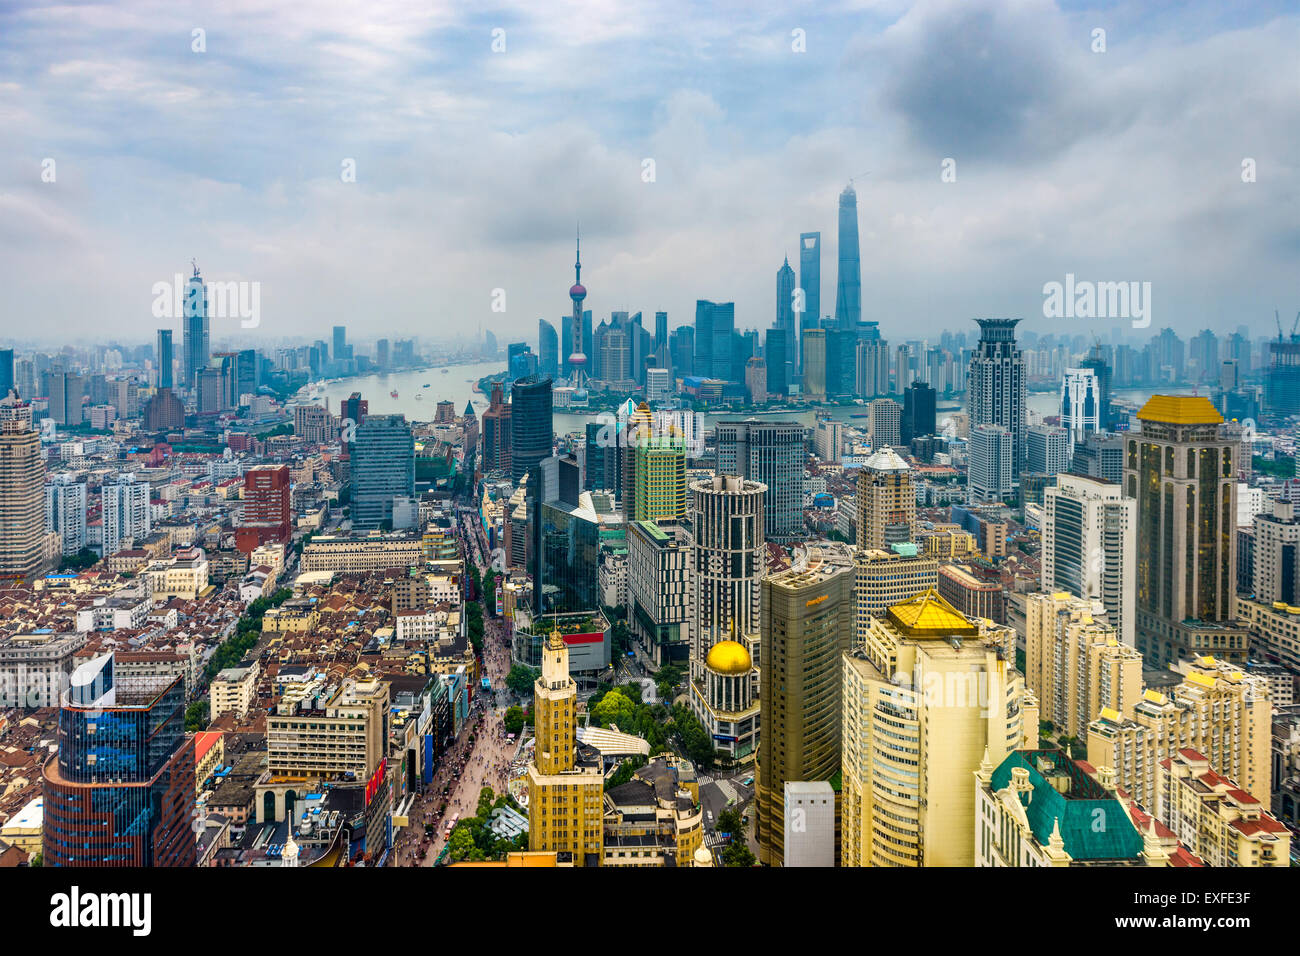 Shanghai, China aerial skyline. - Stock Image